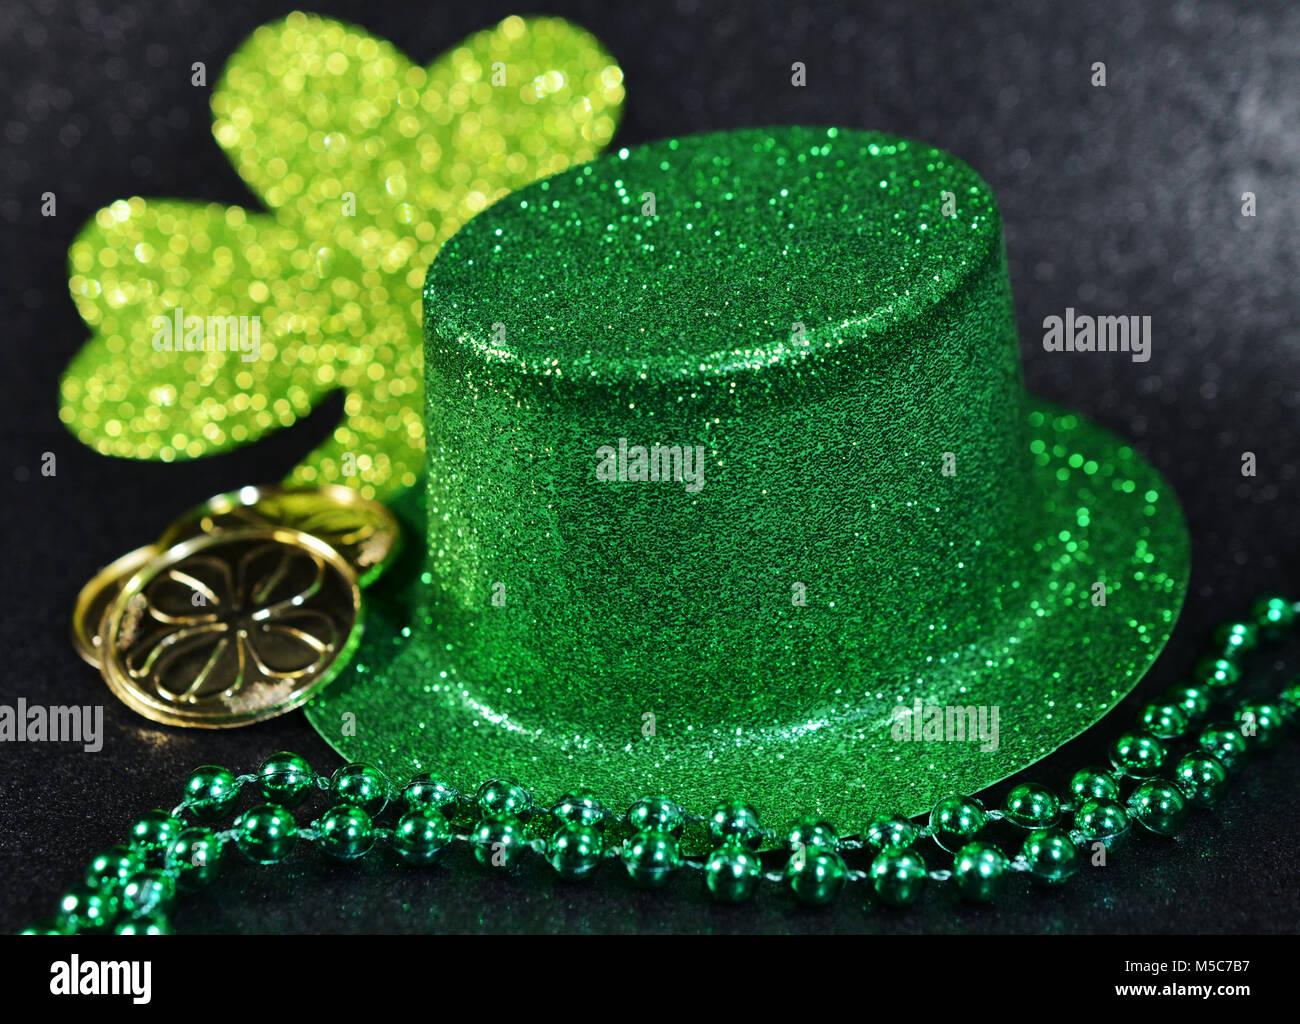 St Patricks Day Irish Fun Socks Lucky Green Clover Irish Socks 'TO BE SURE'